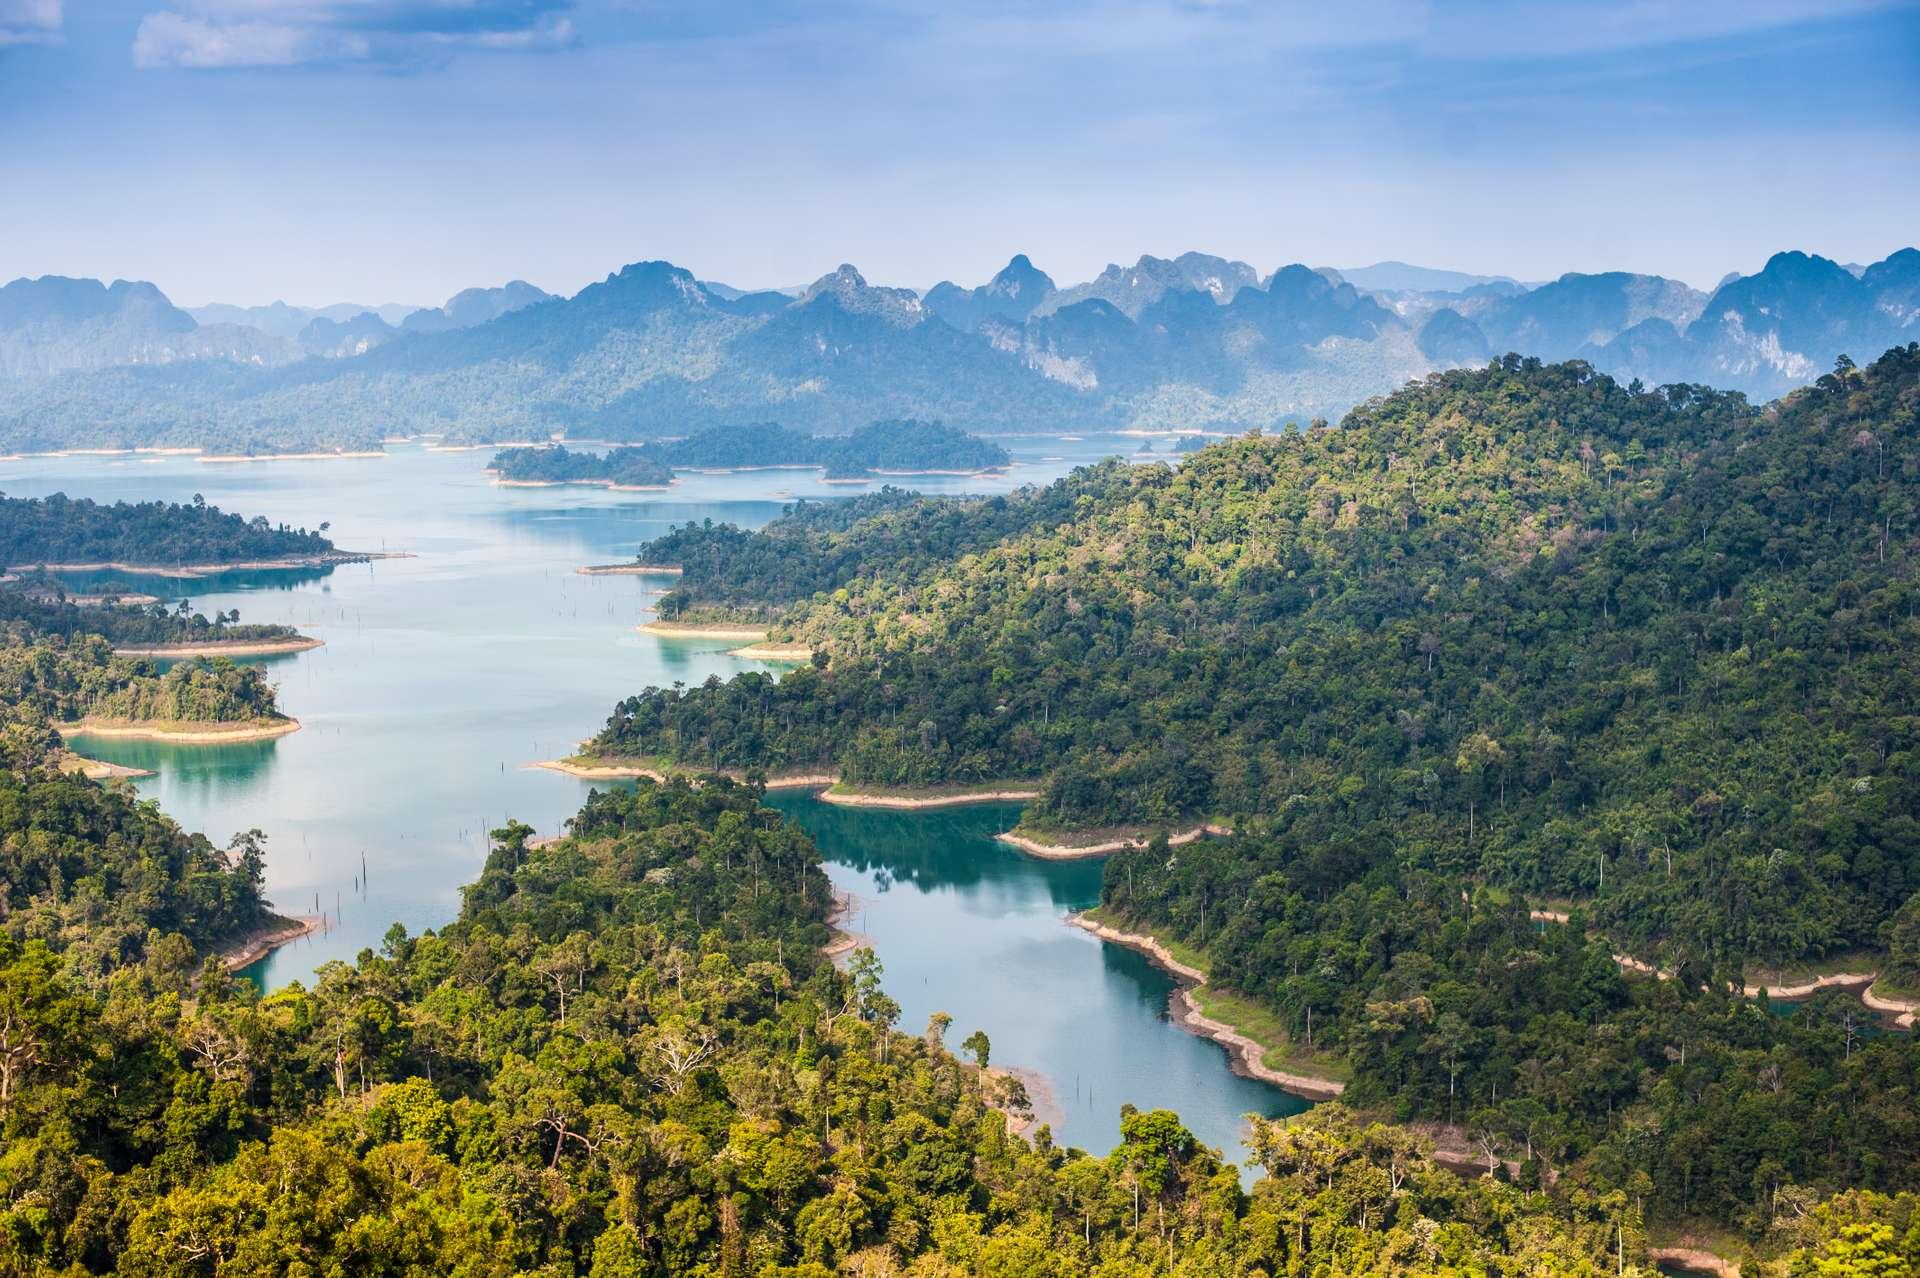 Thailand Suratthani Khao sok national park Ratchaprapha dam